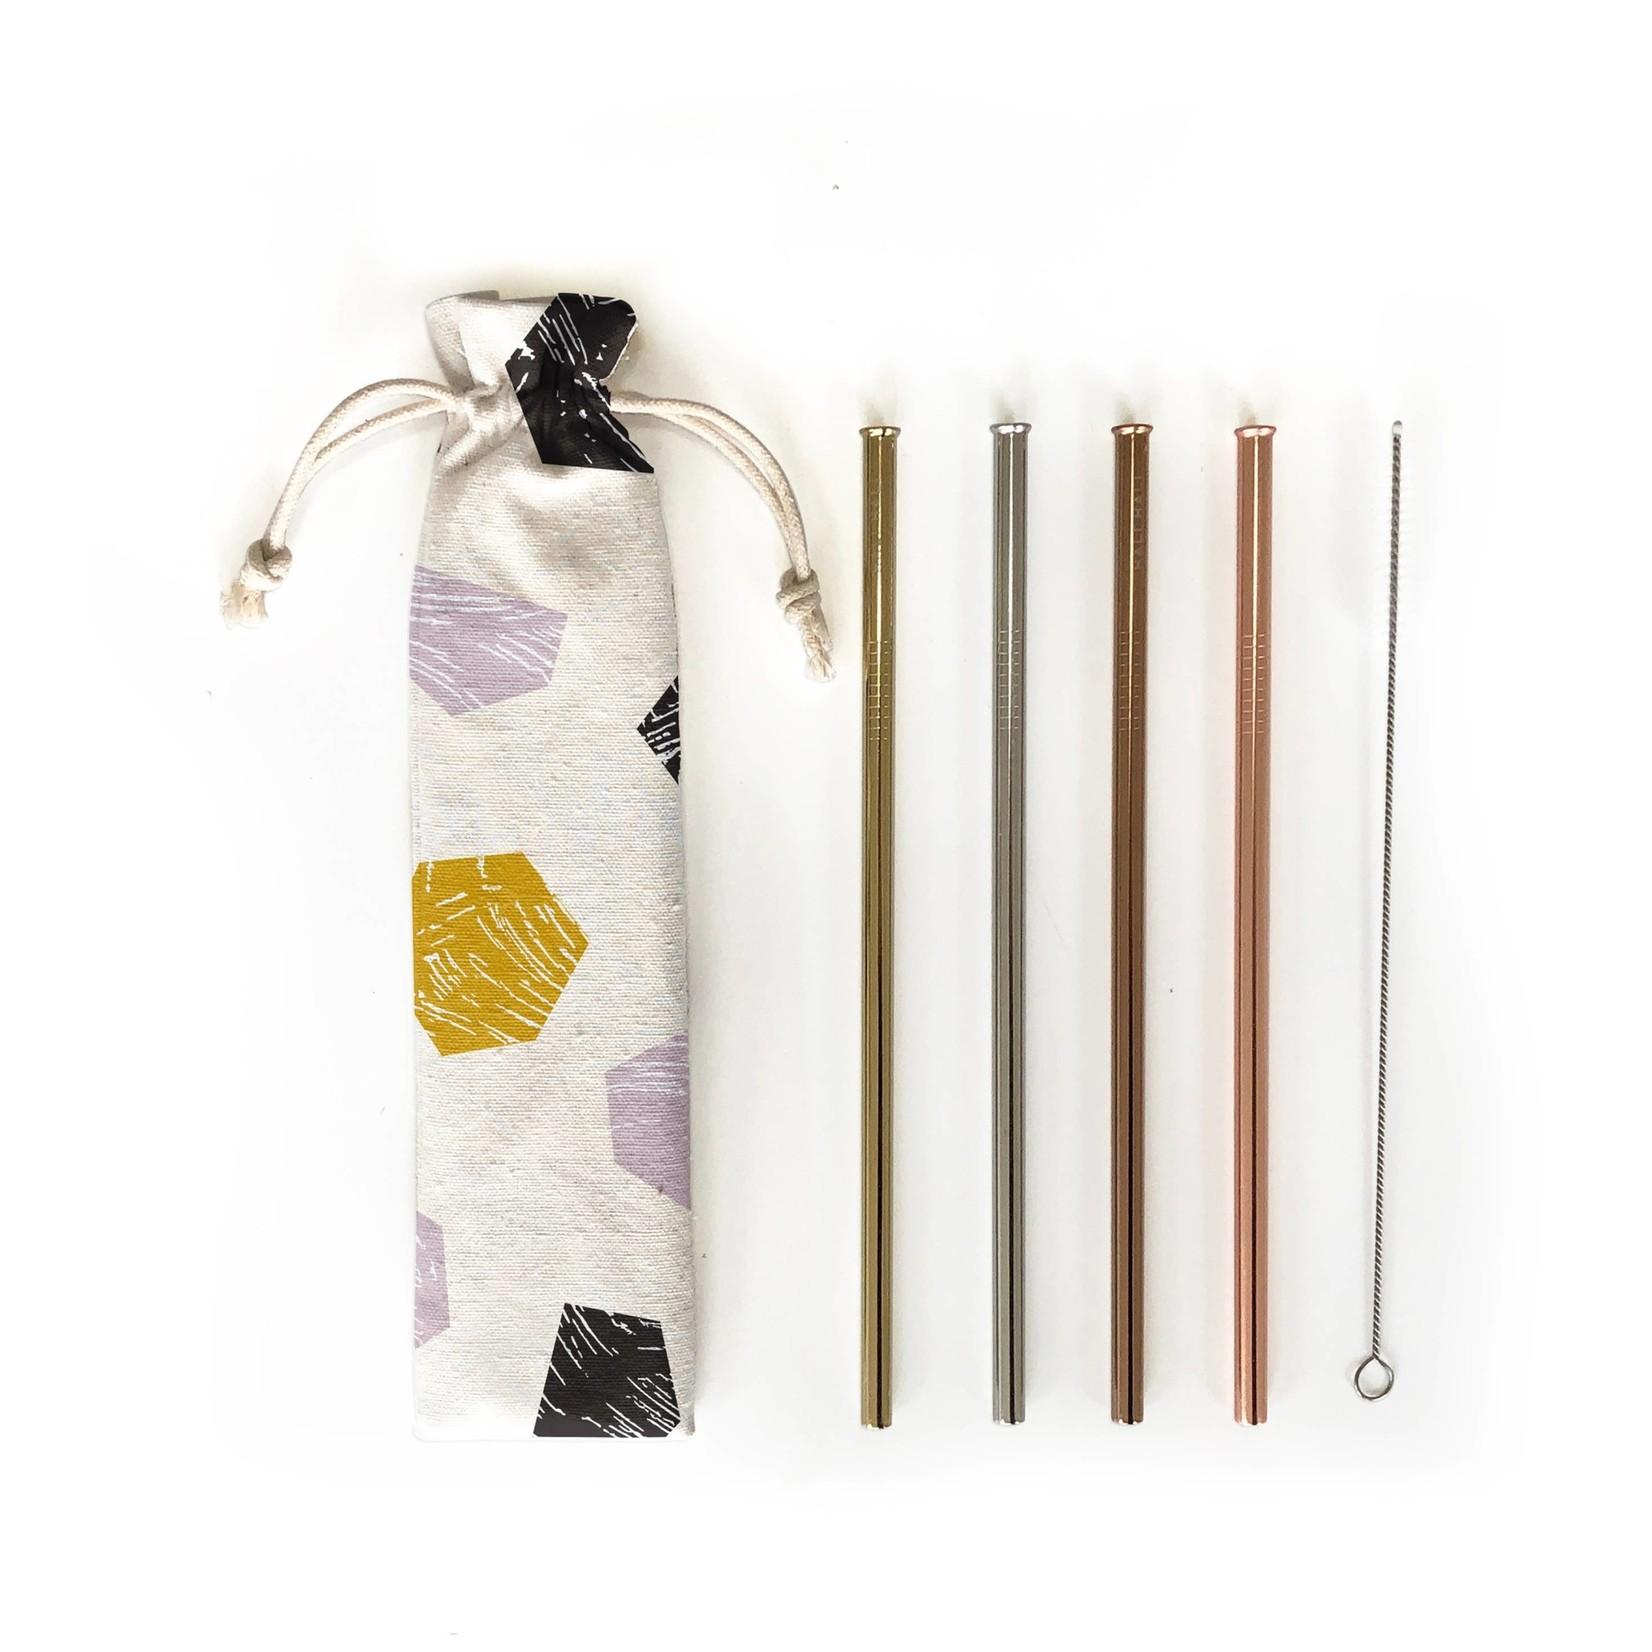 Hali Hali LLC Stop & Stare 6 Piece Reusable Straw Set